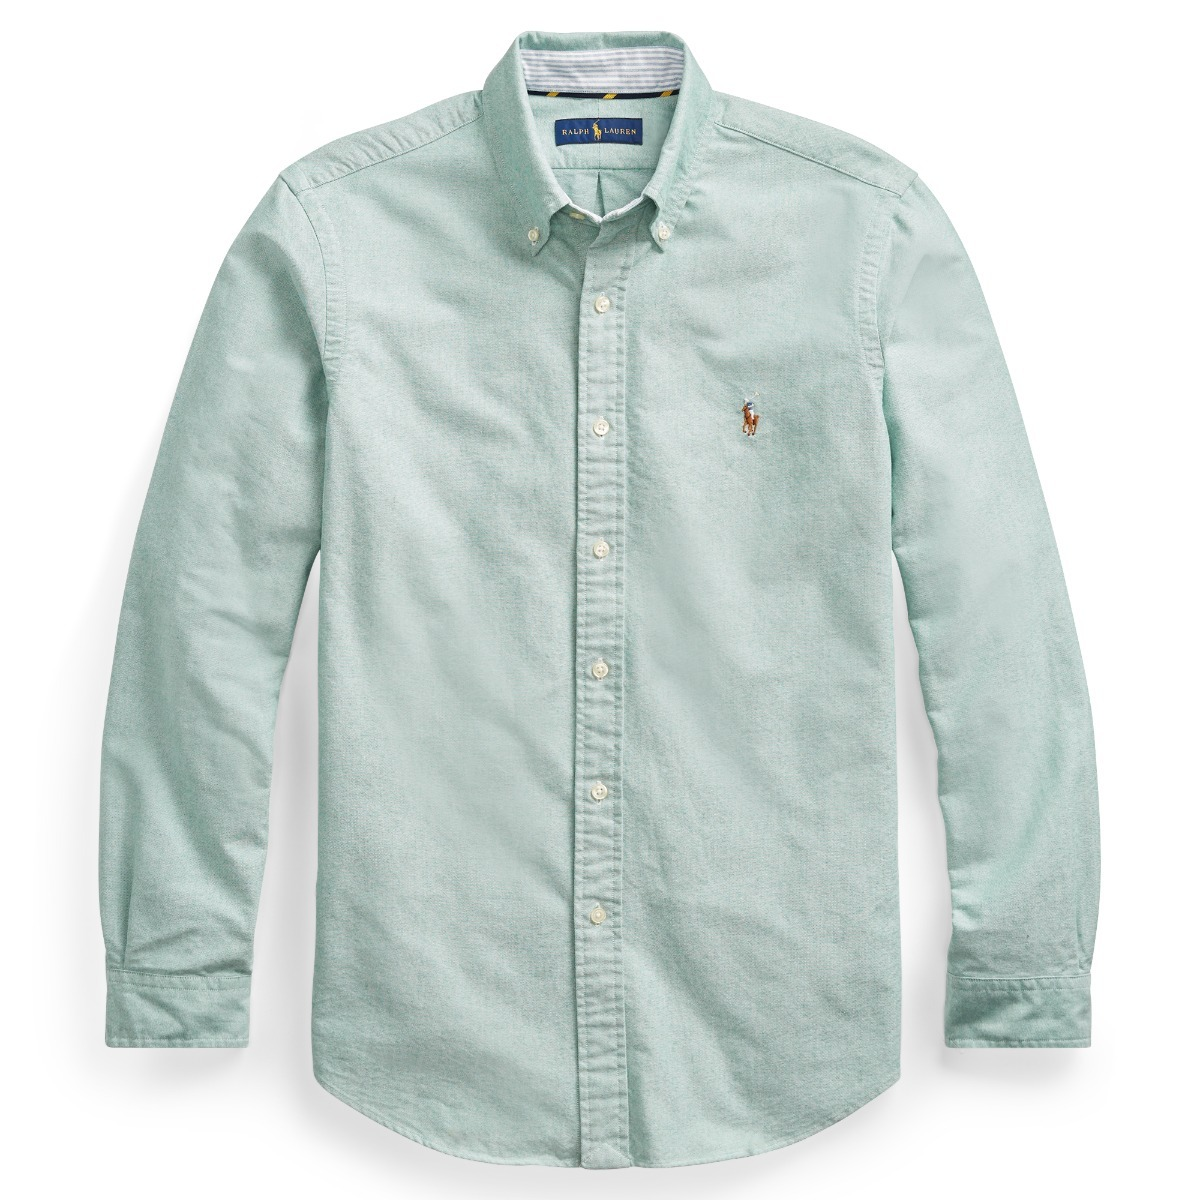 12c33dc4d84c4 camisa social polo ralph lauren tamanho ggg xxl classic fit. Carregando zoom .